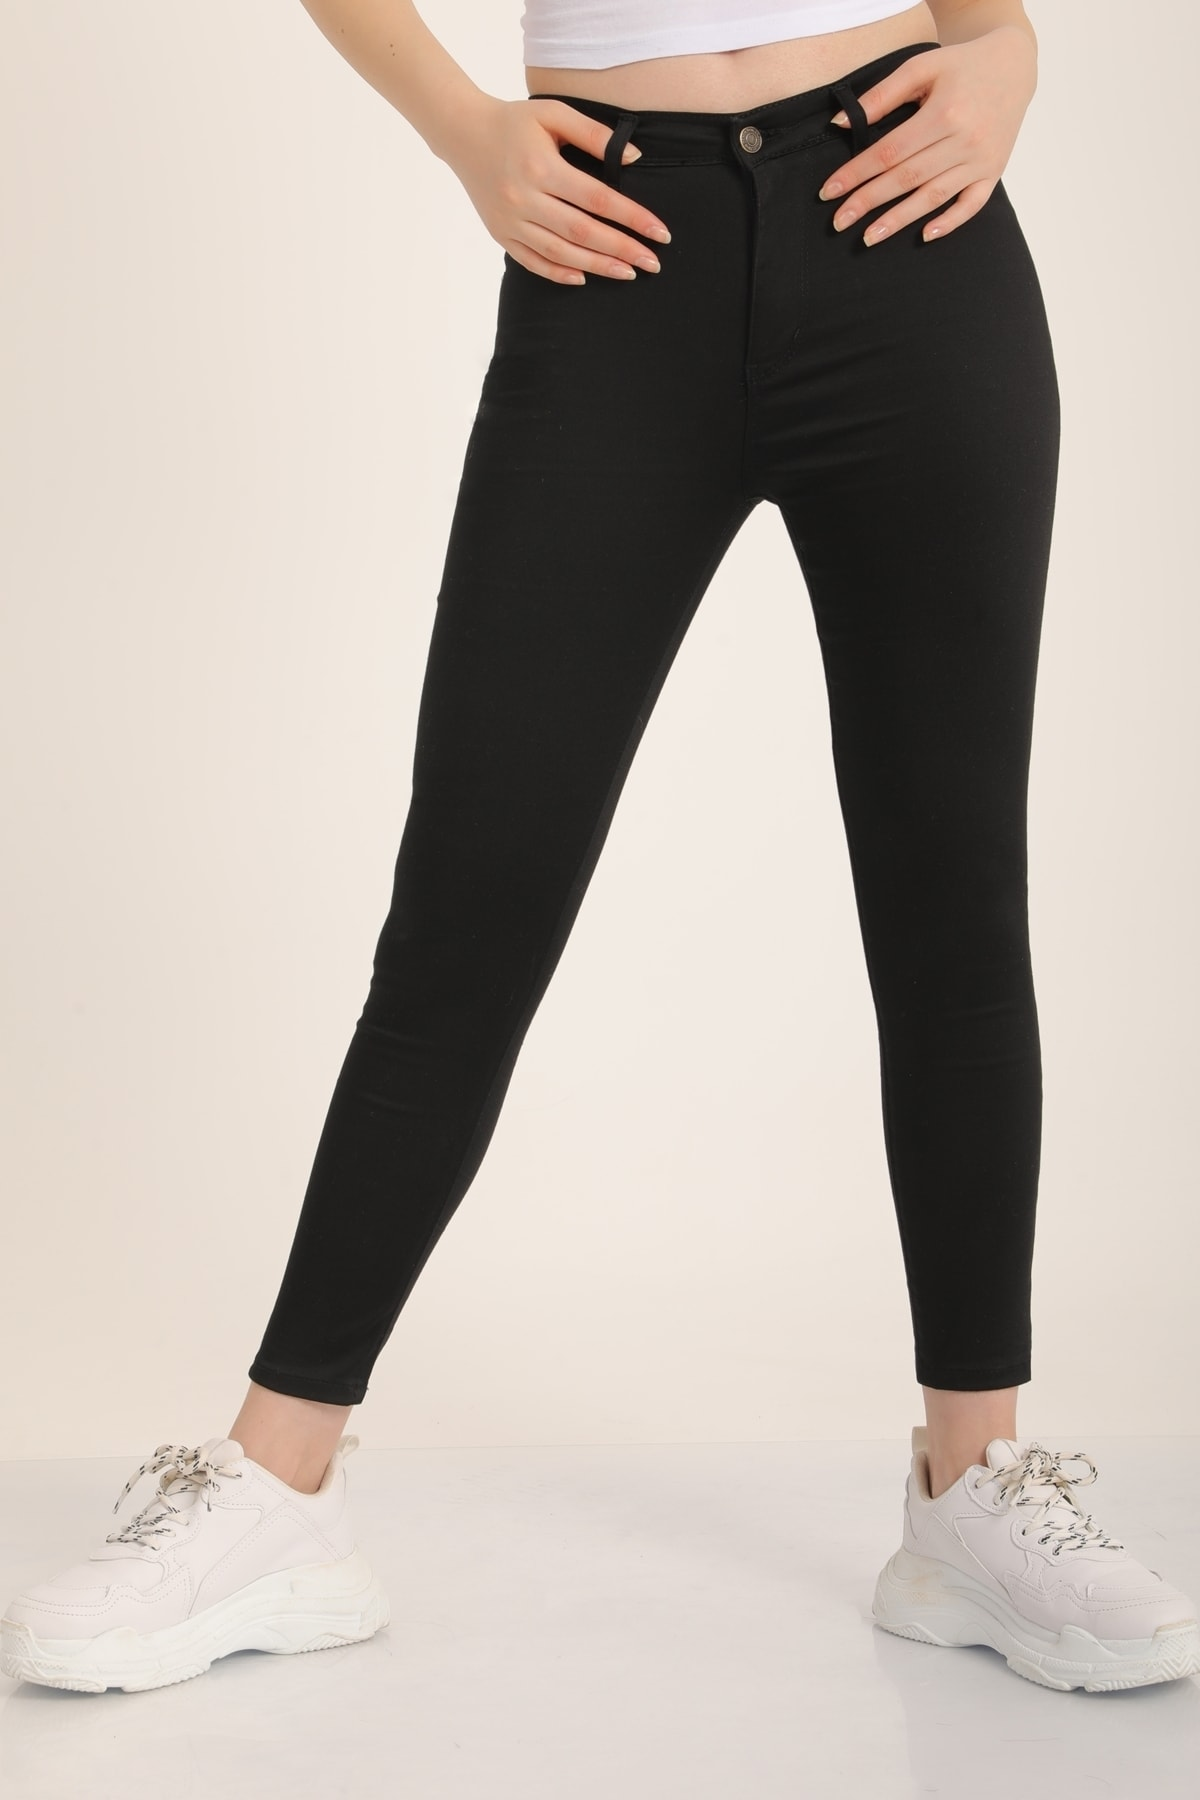 MD trend Kadın Siyah Yüksek Bel Skinny Jean Pantolon Mdt4542 2